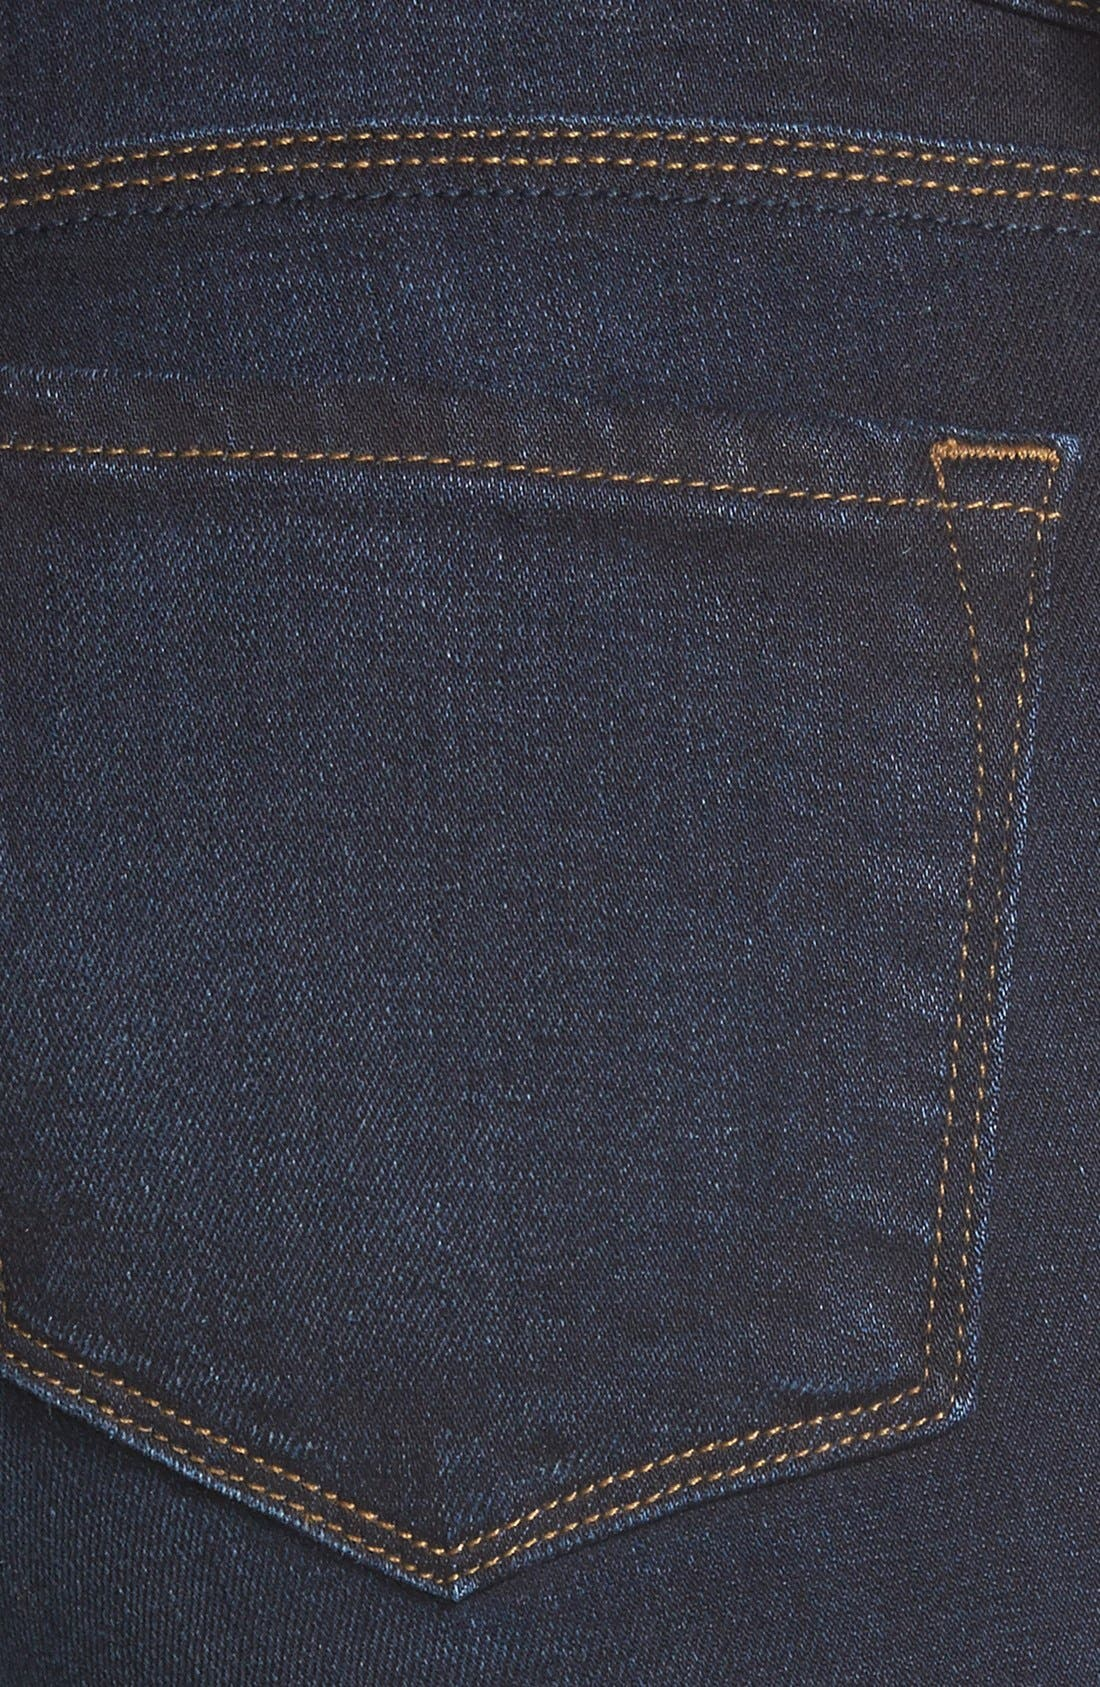 Alternate Image 3  - J Brand Mid Rise Skinny Jeans (Embrace)